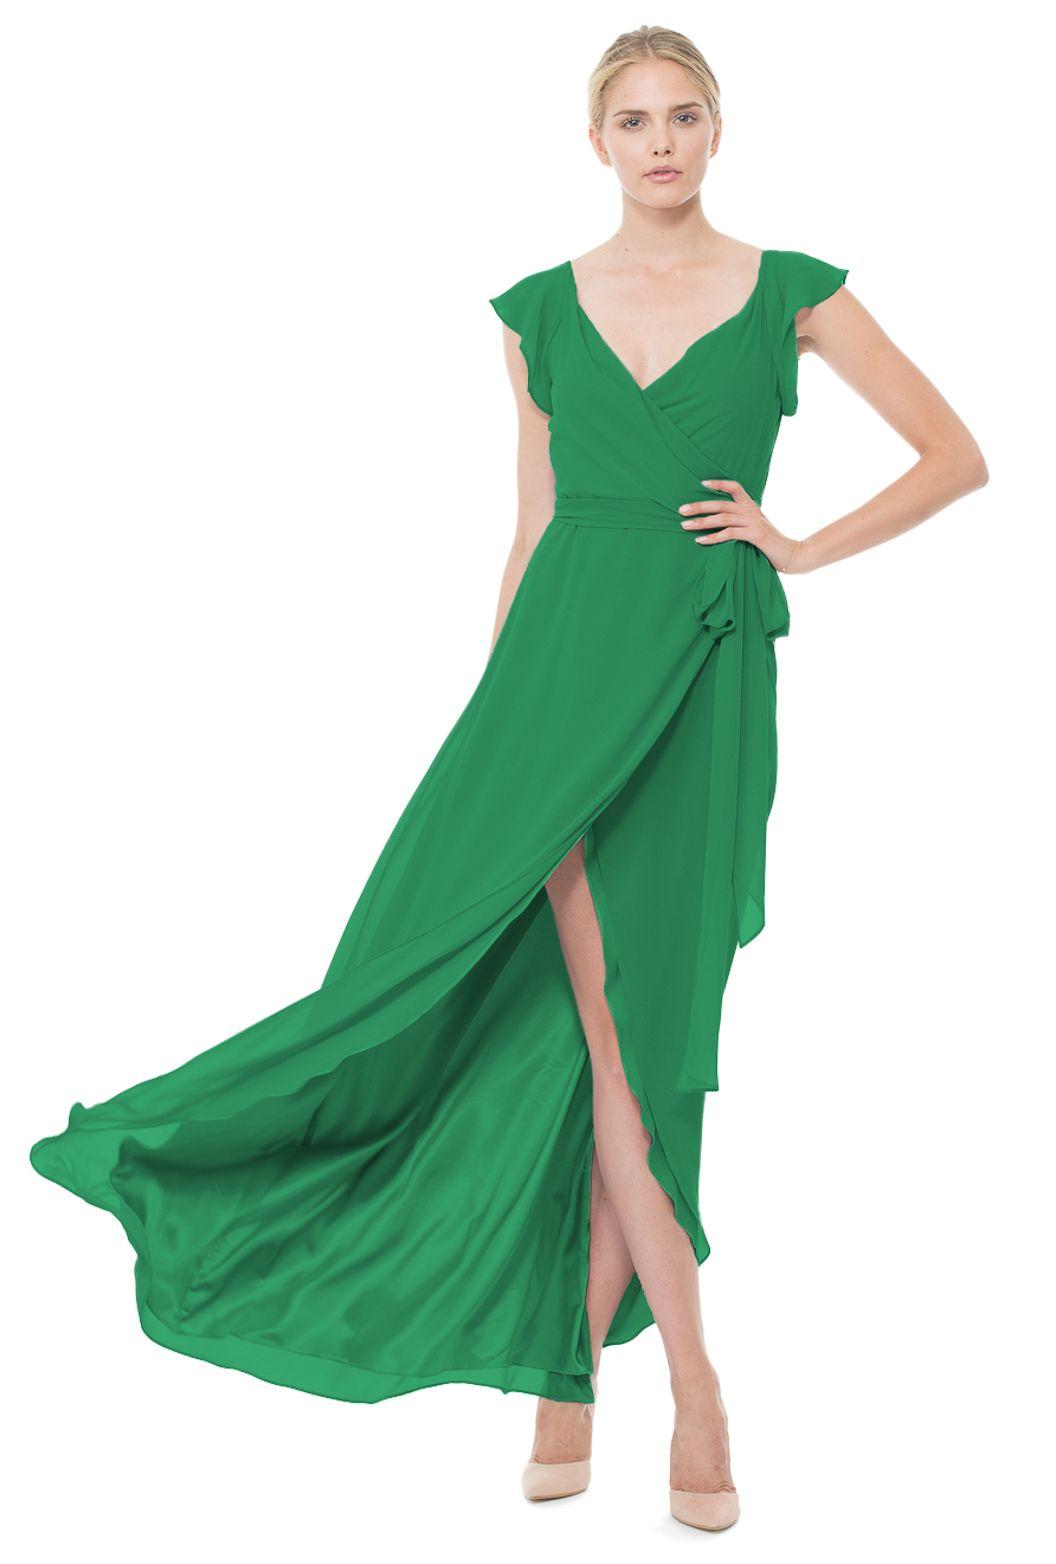 Green dress for wedding  Joanna August Dorian Long Bridesmaid Dress  Weddington Way